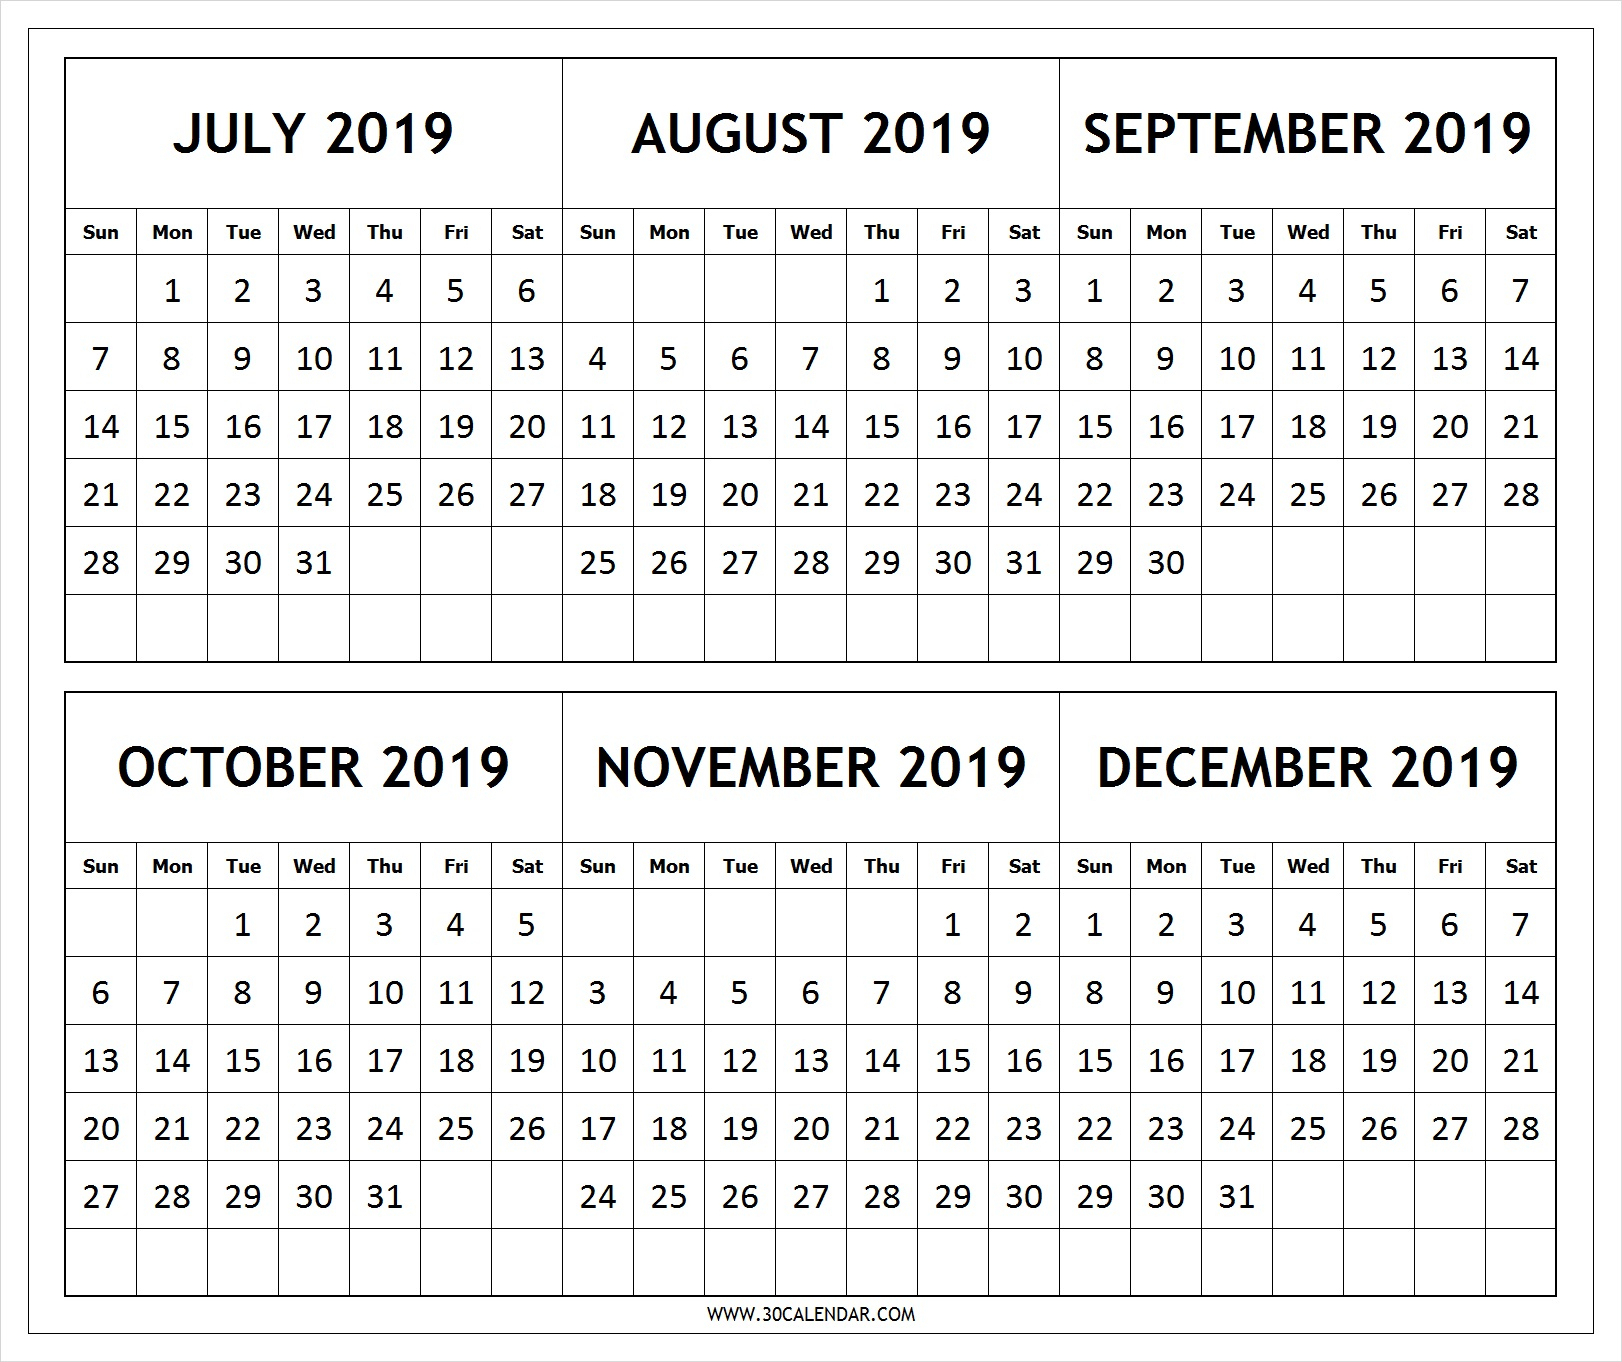 Calendar 2019 July To December Printable | 6 Month 2019 Calendar